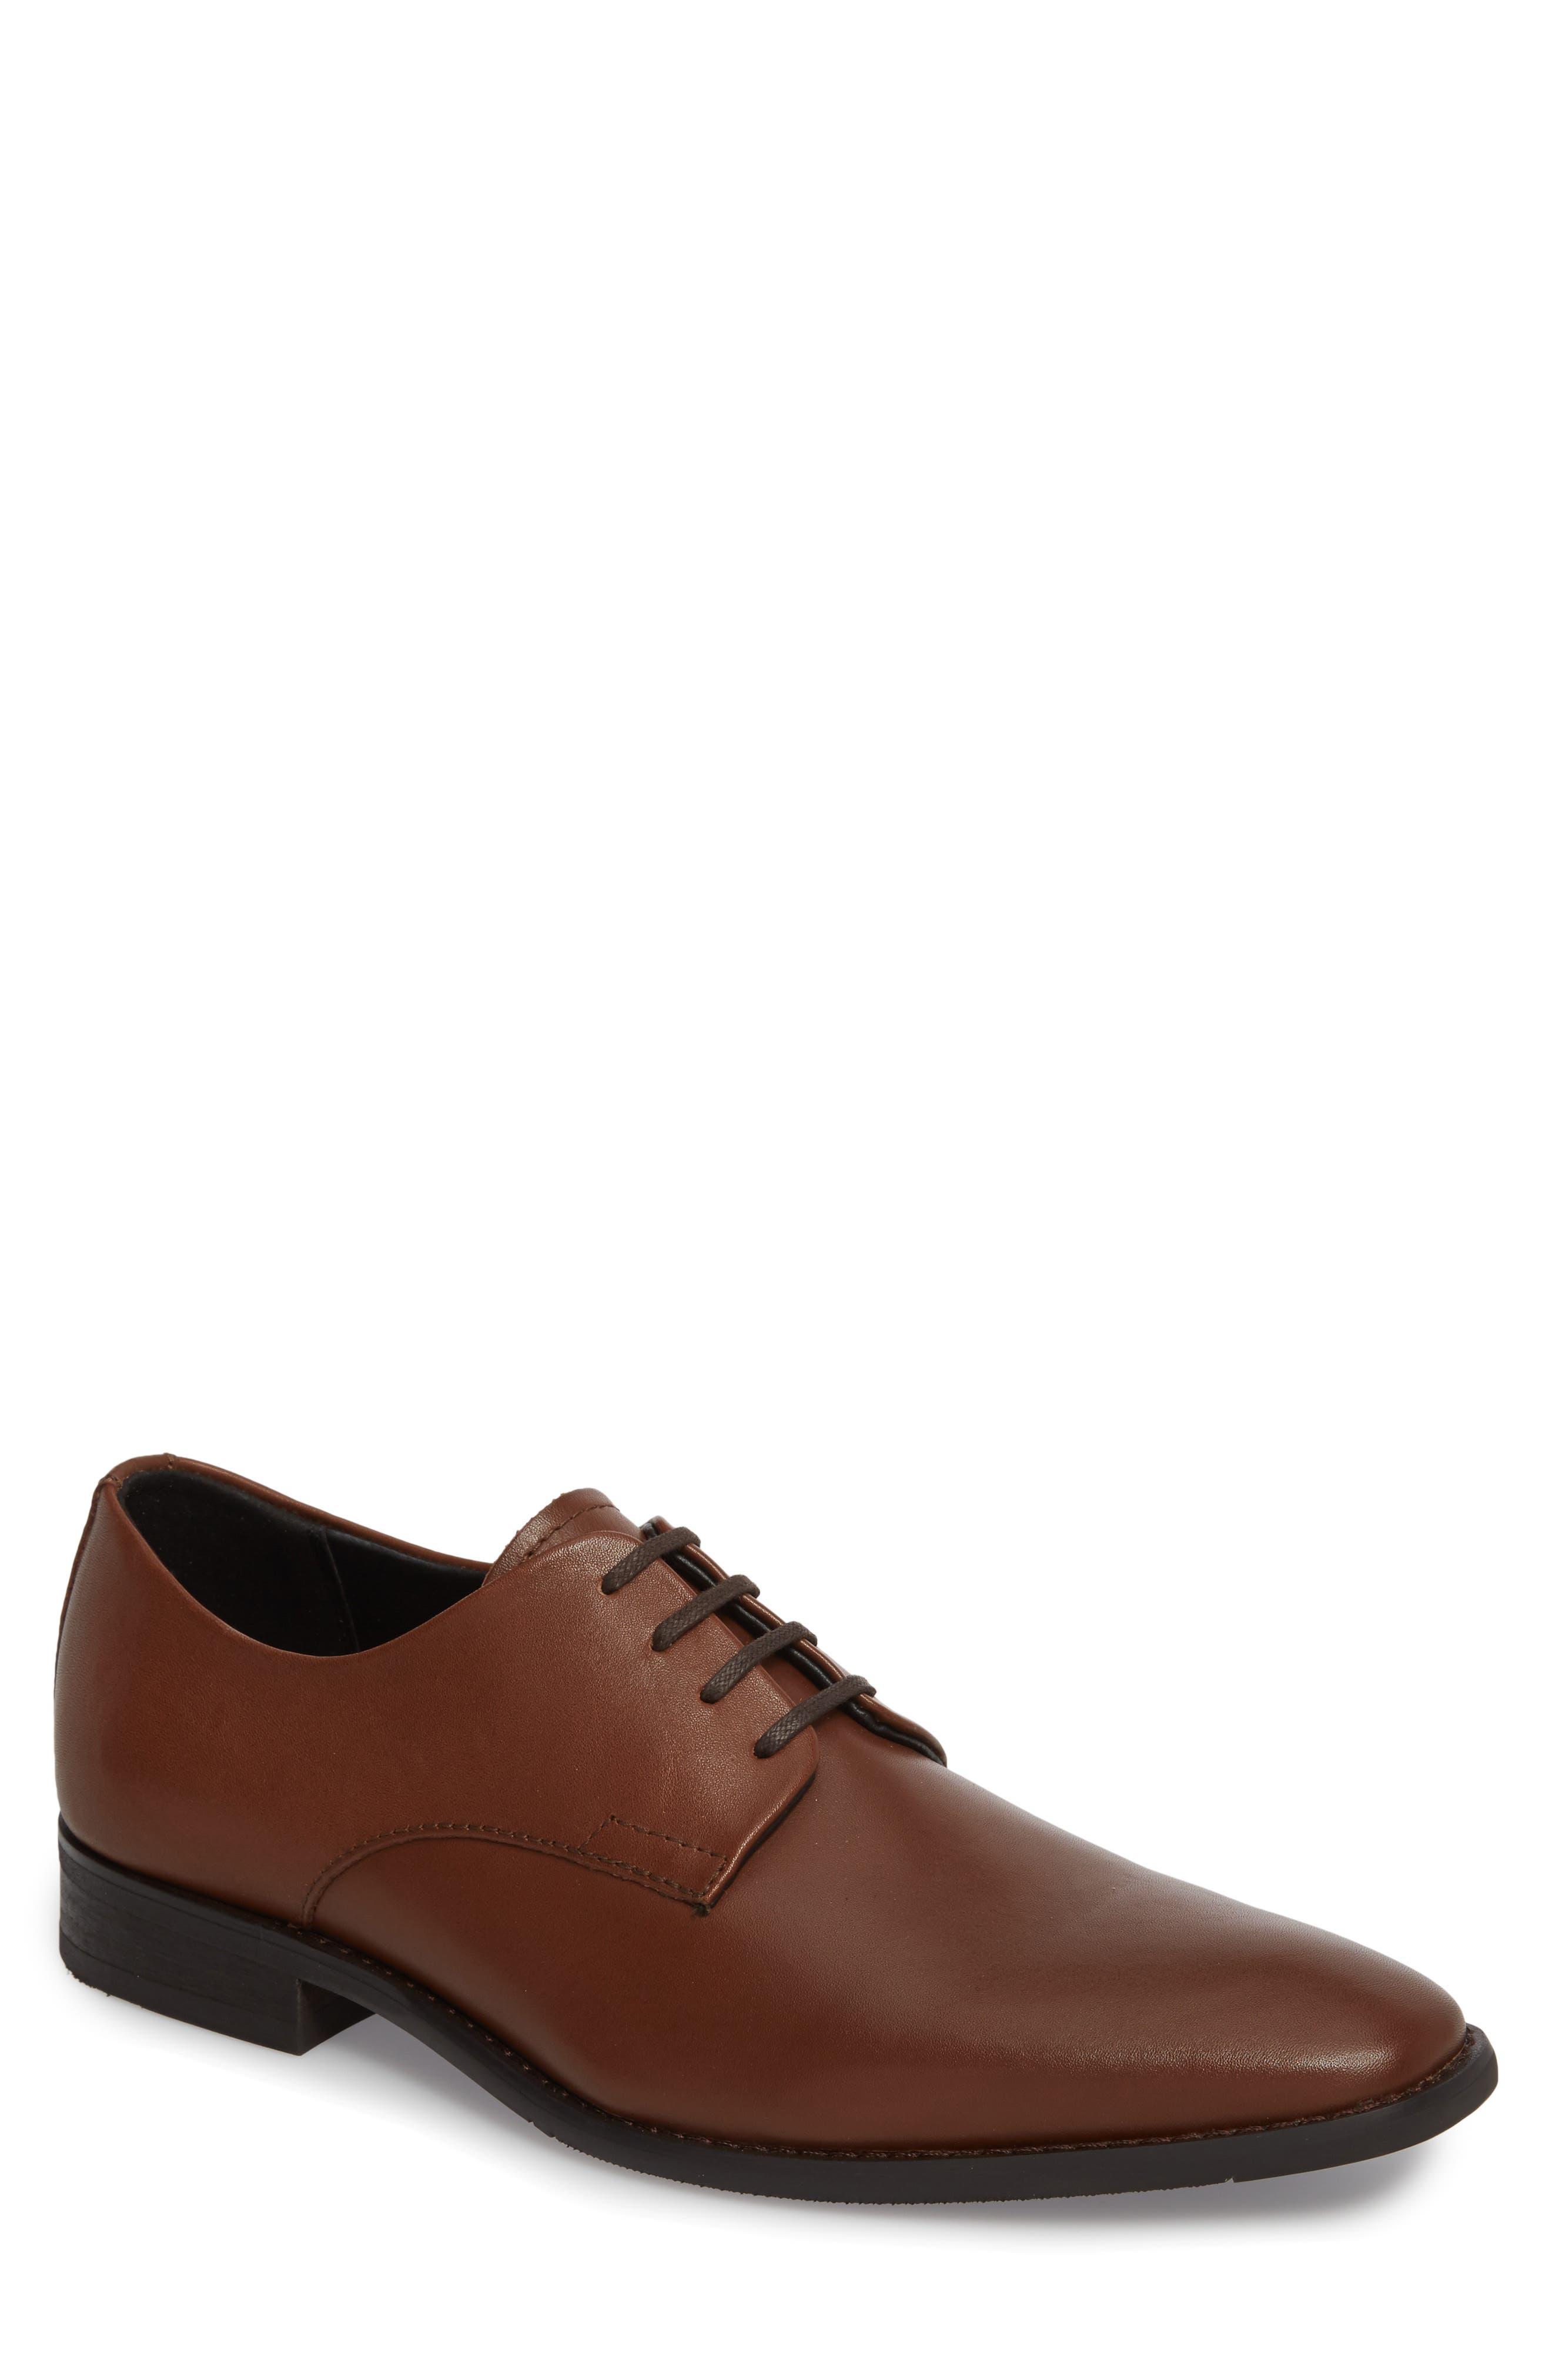 'Ramses' Plain Toe Derby,                         Main,                         color, Tan Leather